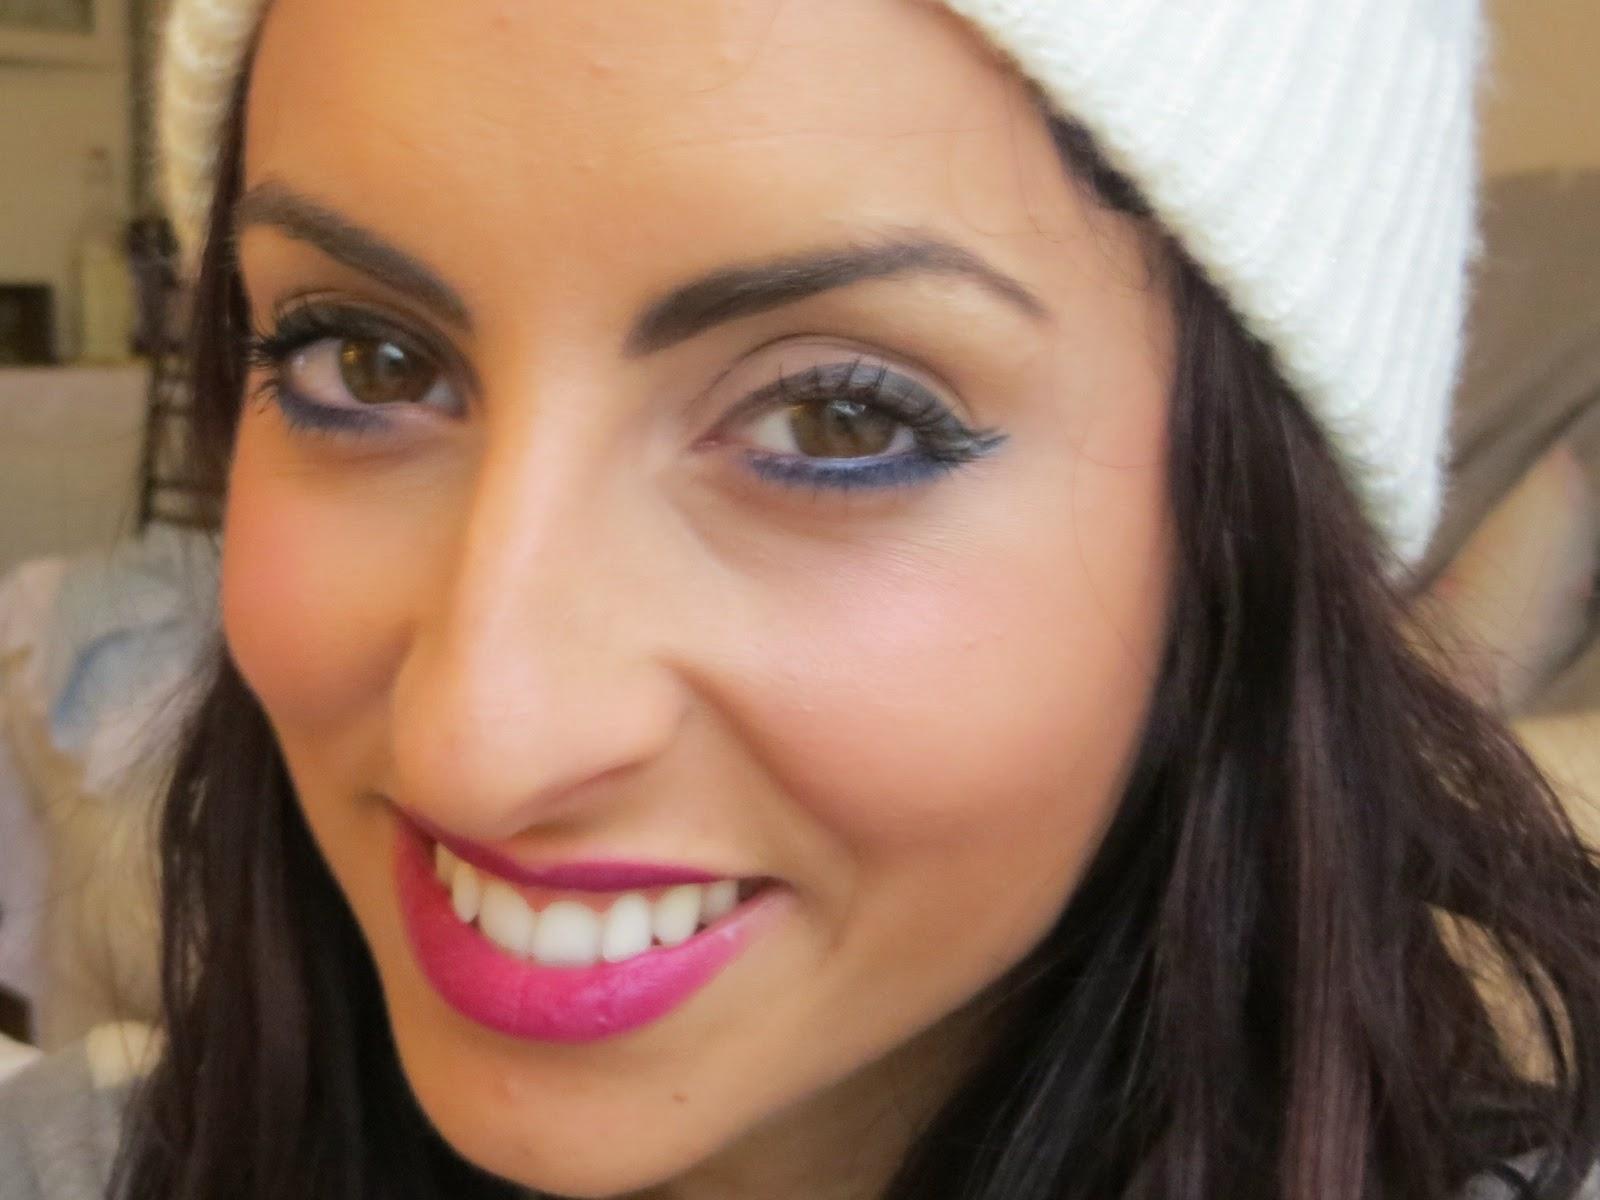 Eye of horus, eye of horus eye pencil, sapphire eye pencil, eye of horus swatch, beauty review, makeup review